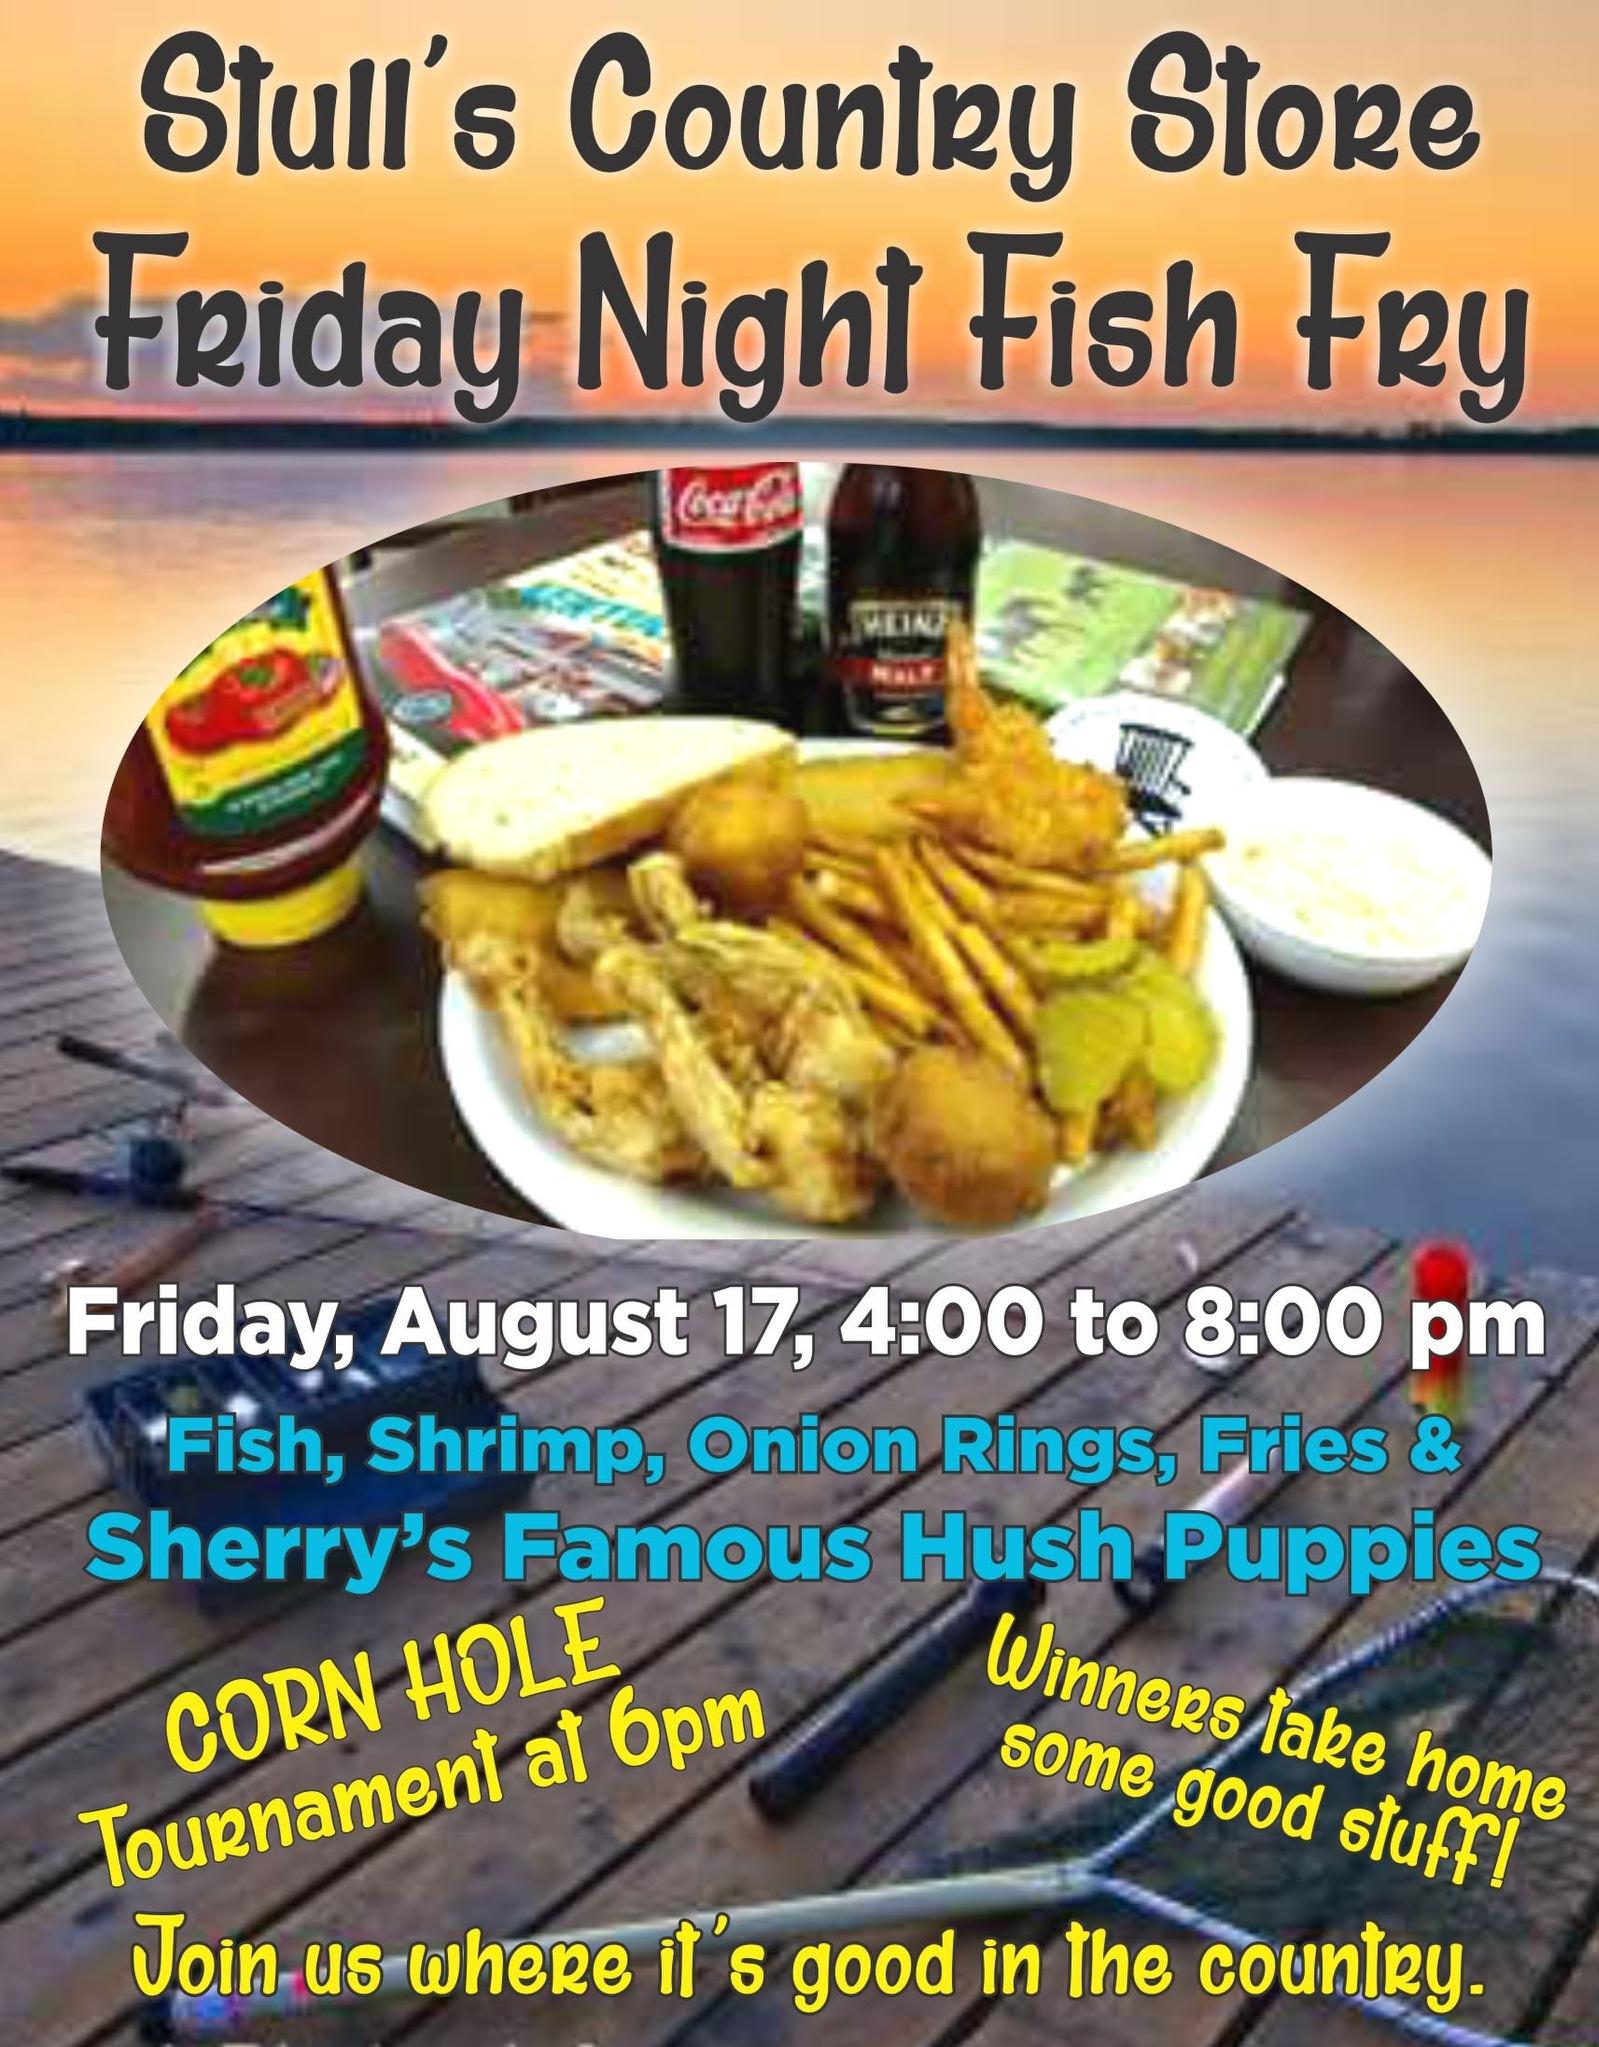 Stull's_Fish_Fry_Friday_2.jpg